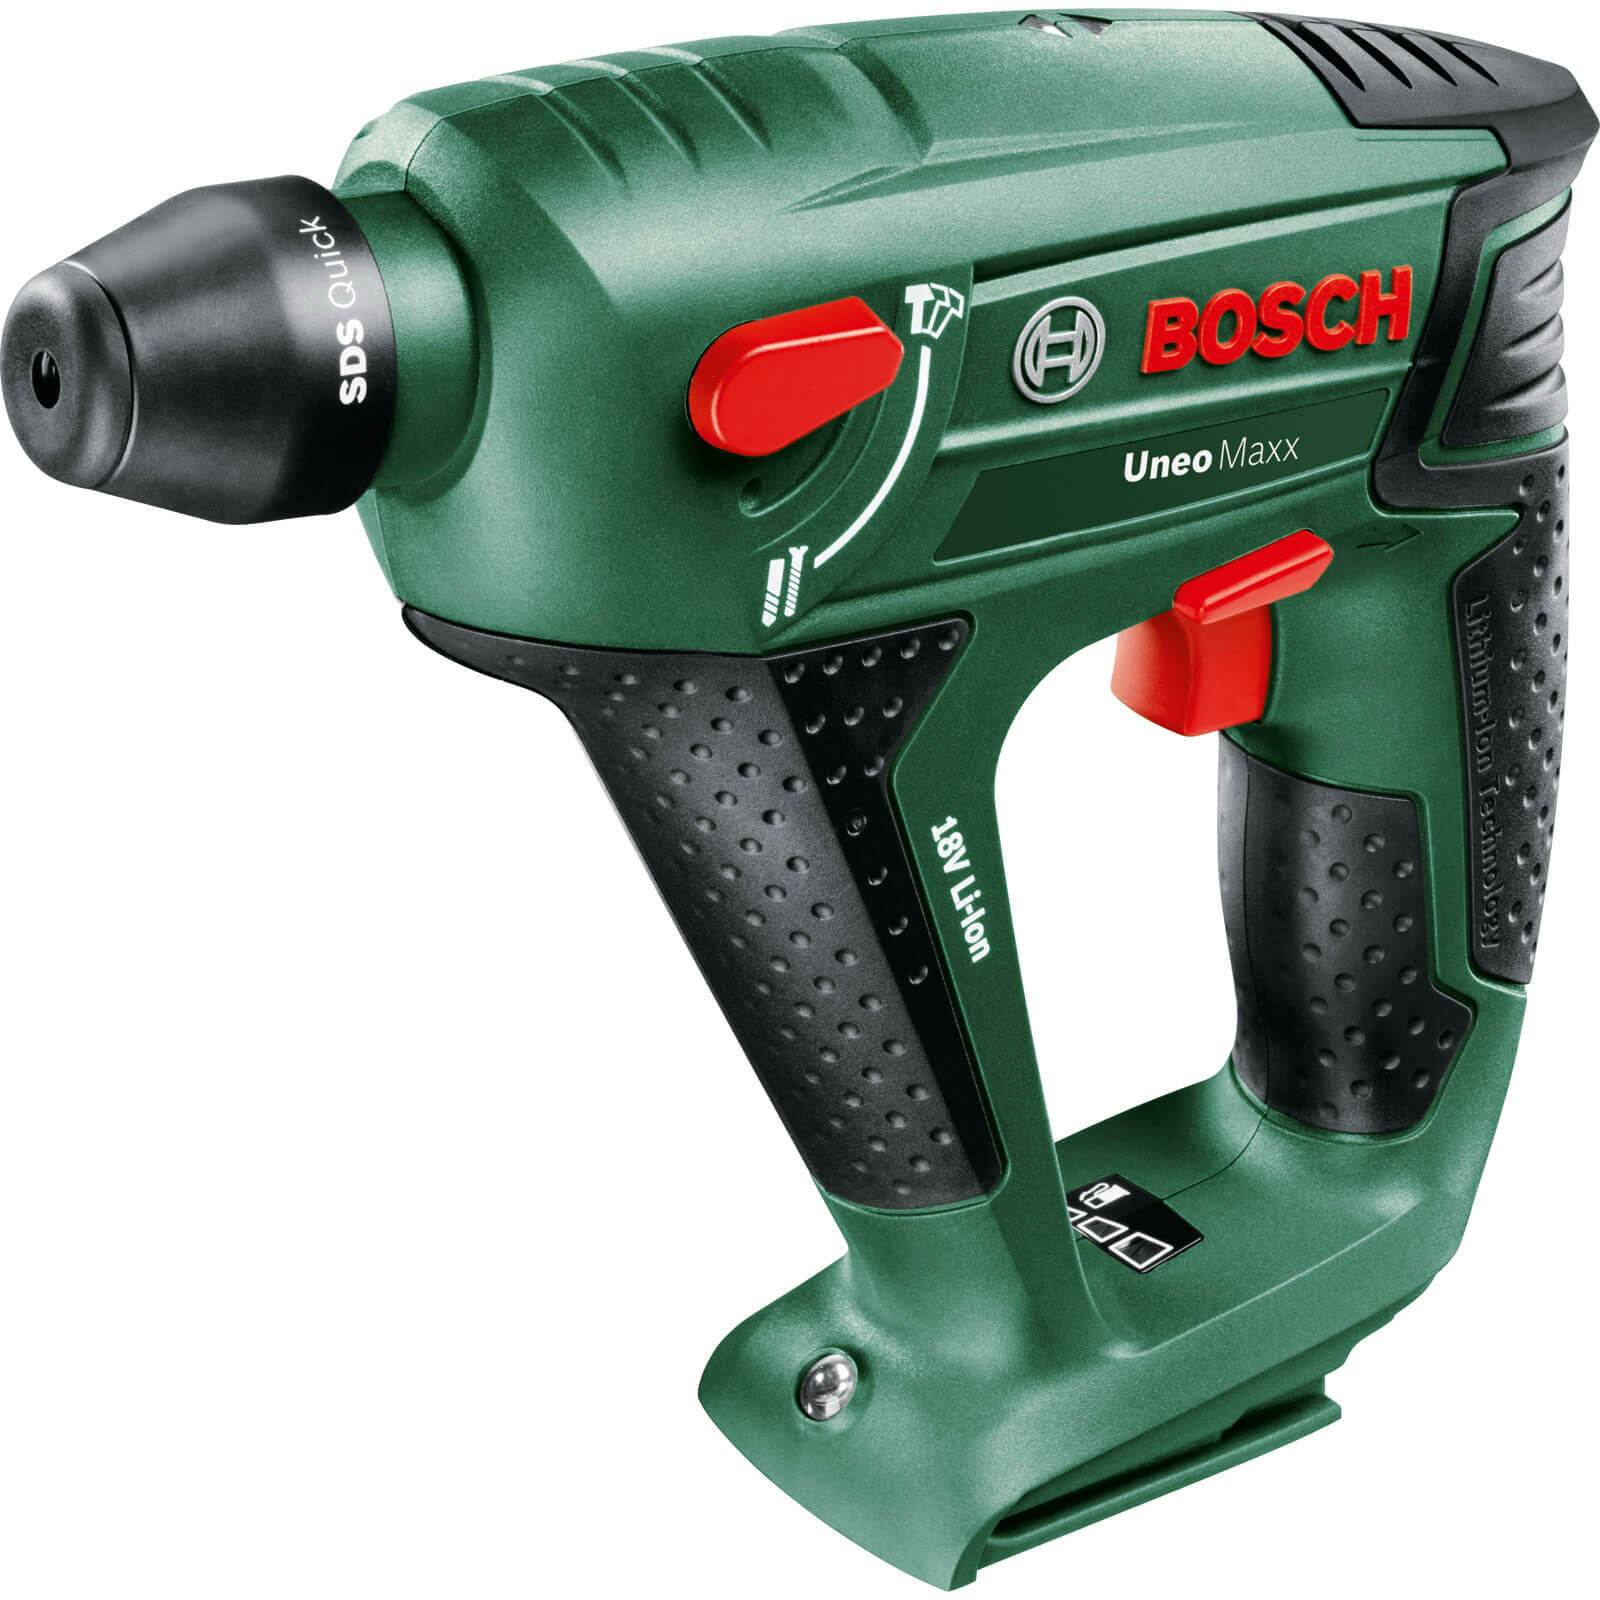 Bosch UNEO Maxx 18v Cordless Combi Drill No Batteries No Charger No Case